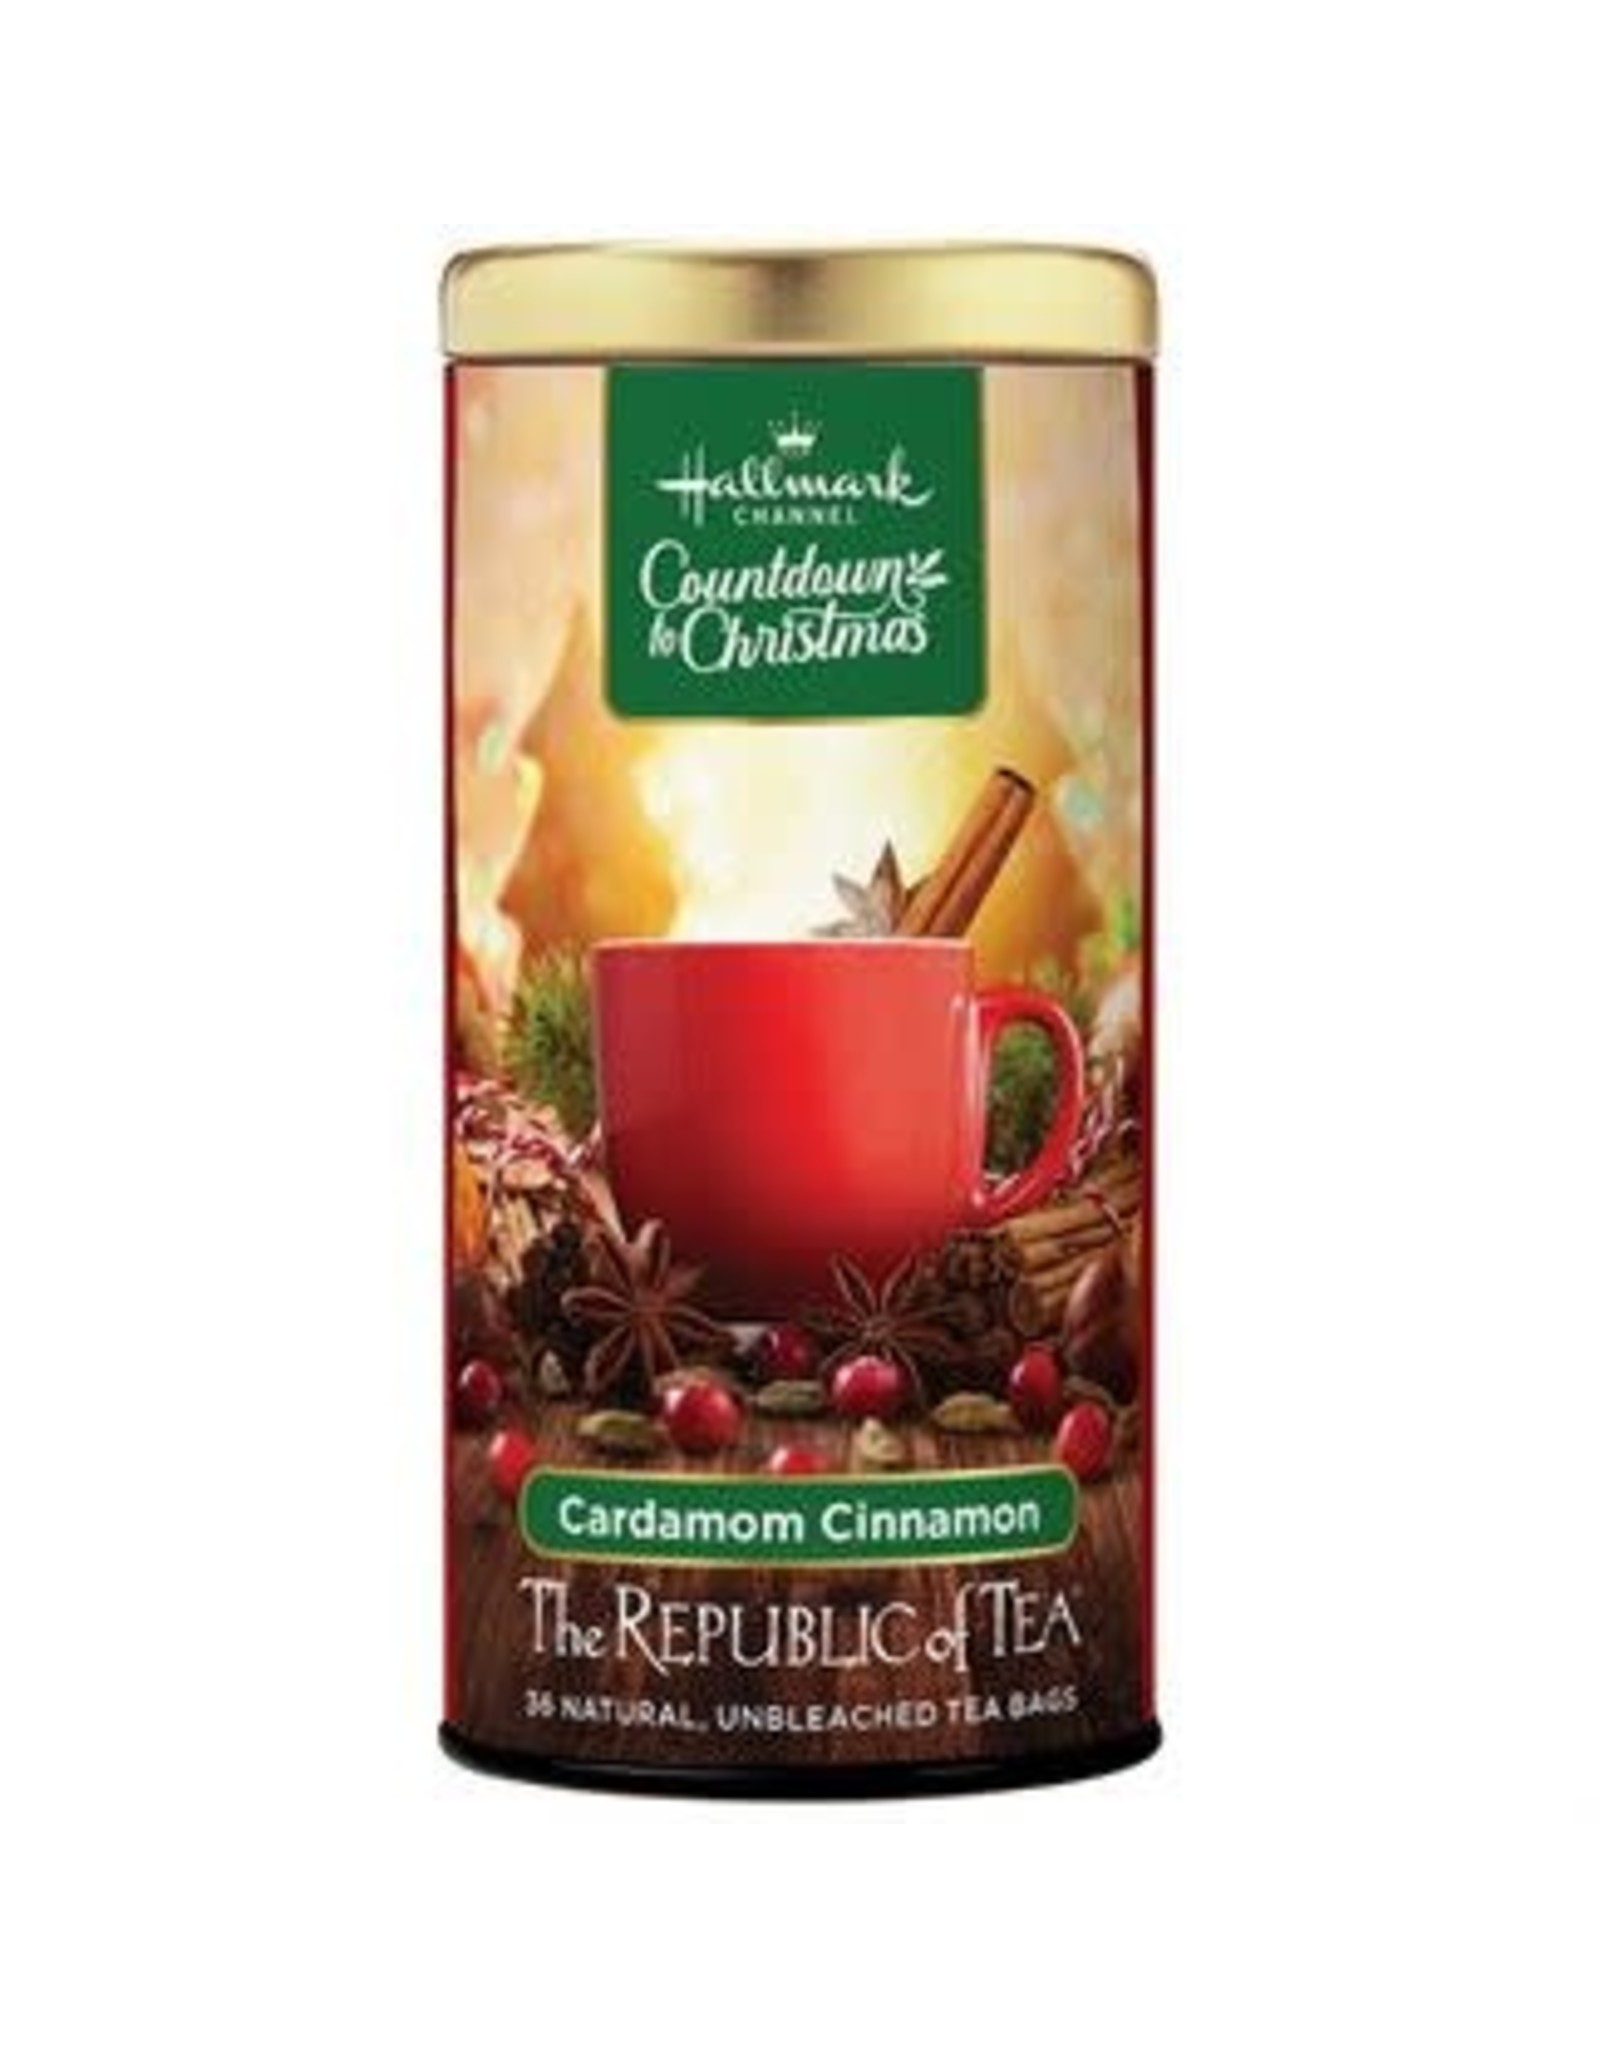 Republic of Tea HALLMARK CARDAMON CINNAMON TEA